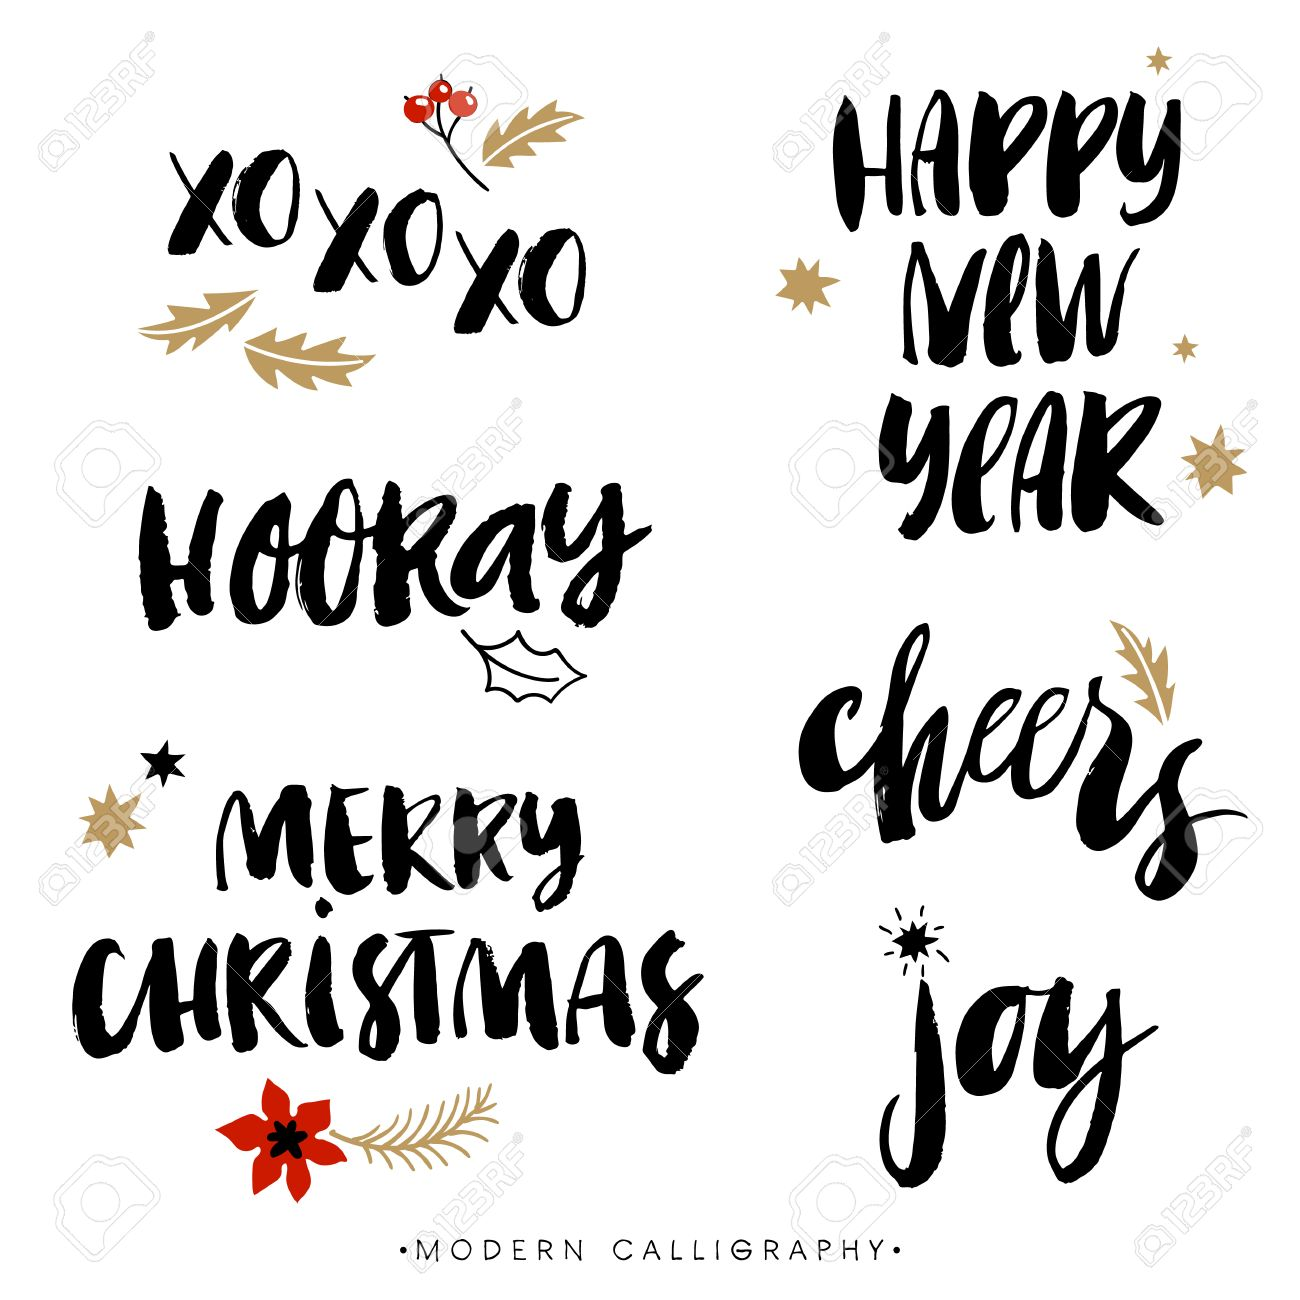 Christmas calligraphy phrases. XOXO. Happy New Year. Merry Christmas. Hooray. Cheers. Joy. Handwritten modern brush lettering. Hand drawn design elements. - 47968960